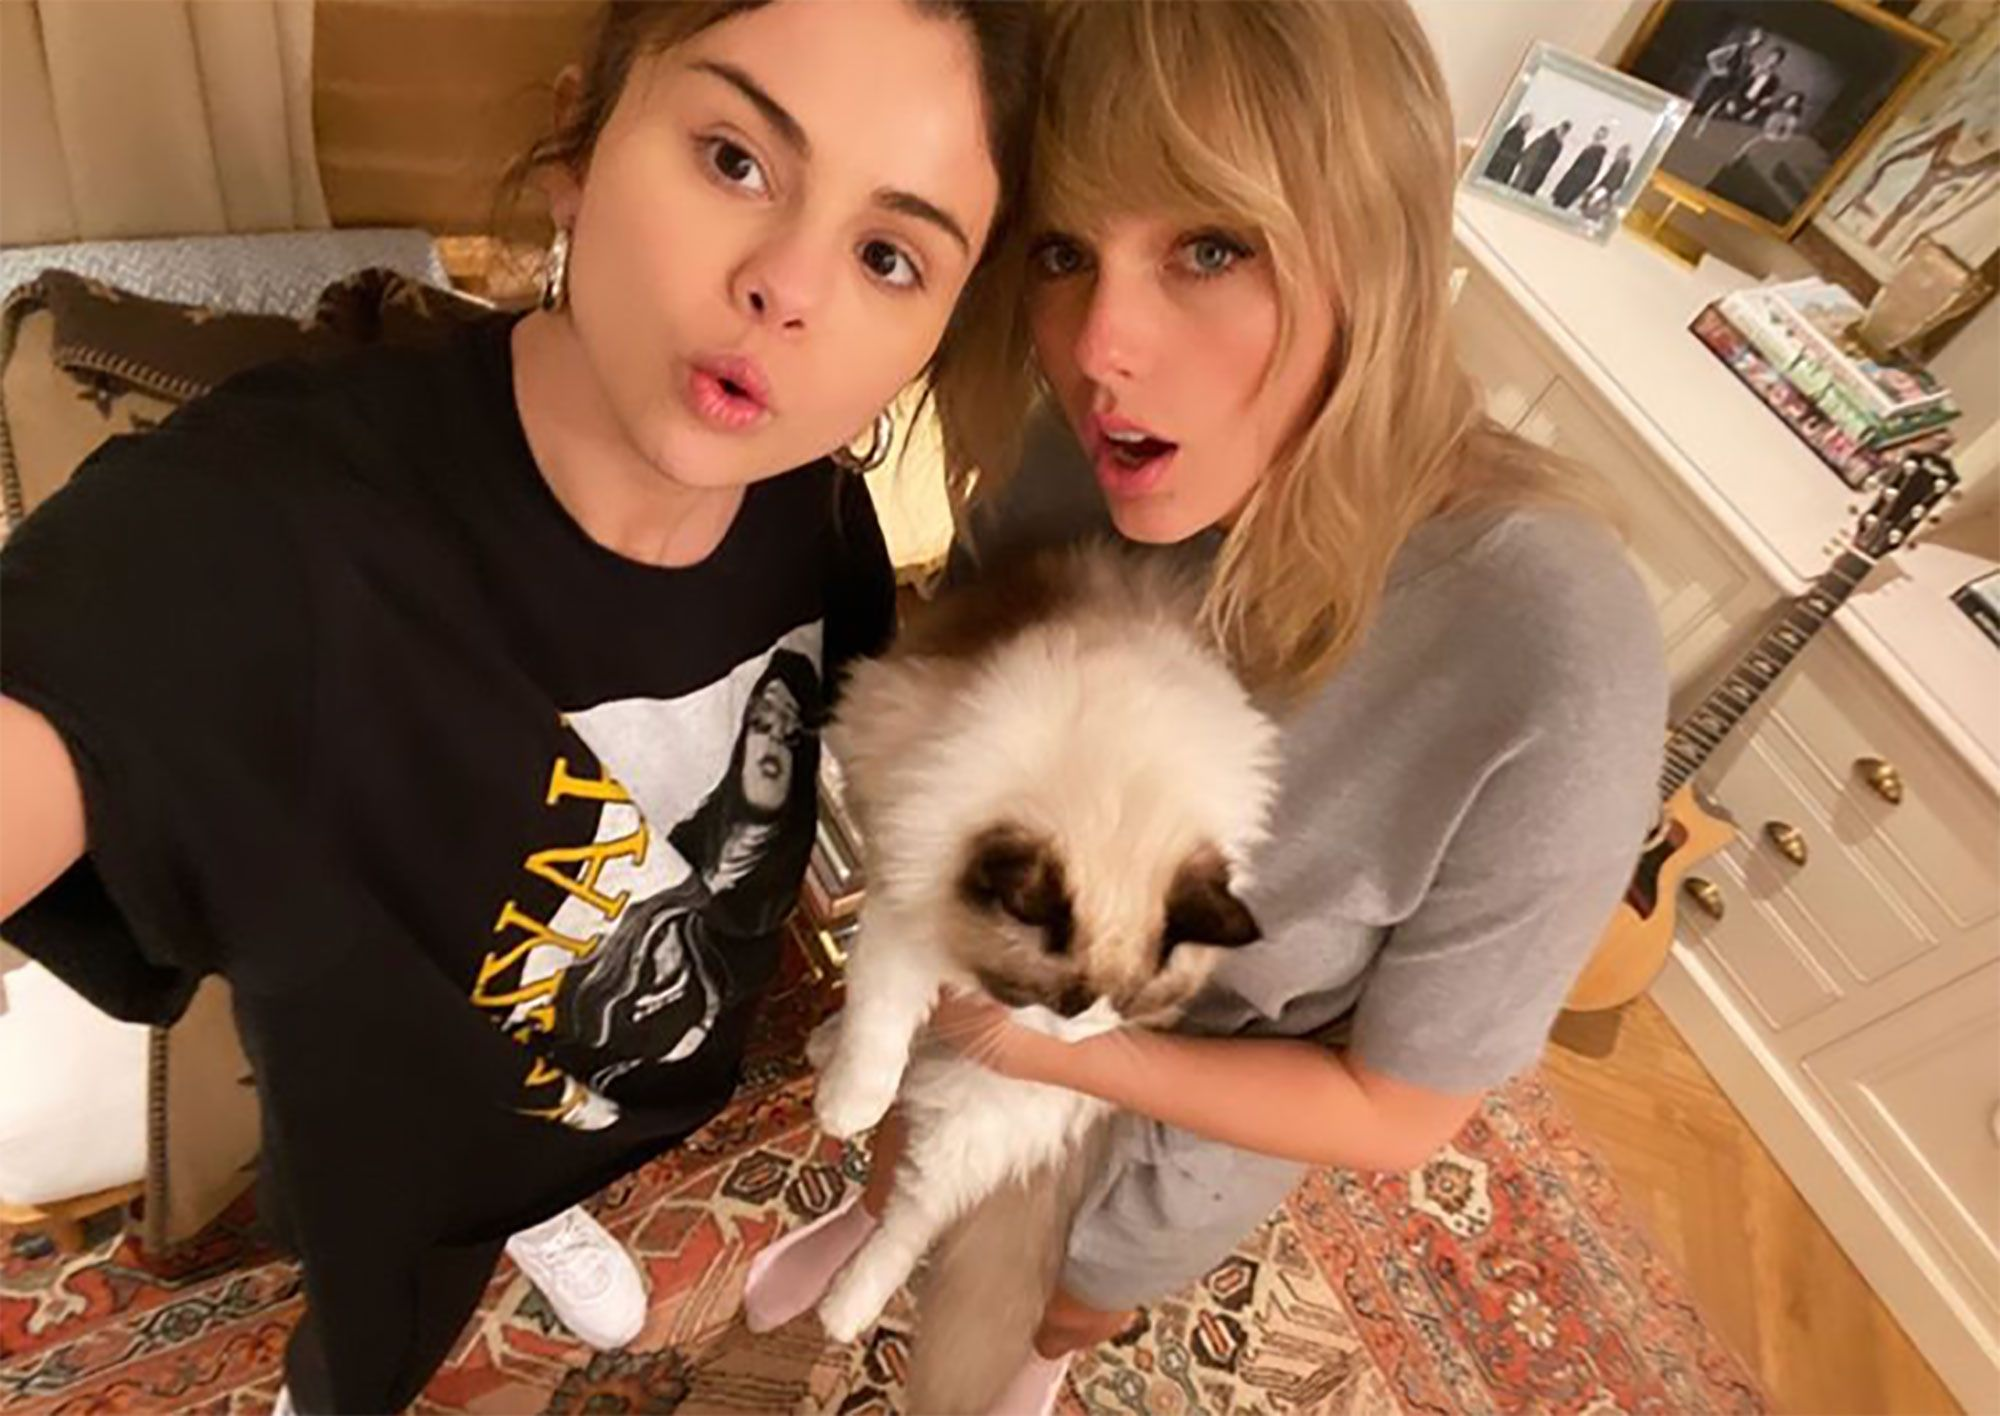 Why Selena Gomez Deleted Her Kim Kardashian Skims Instagram To Support Taylor Swift